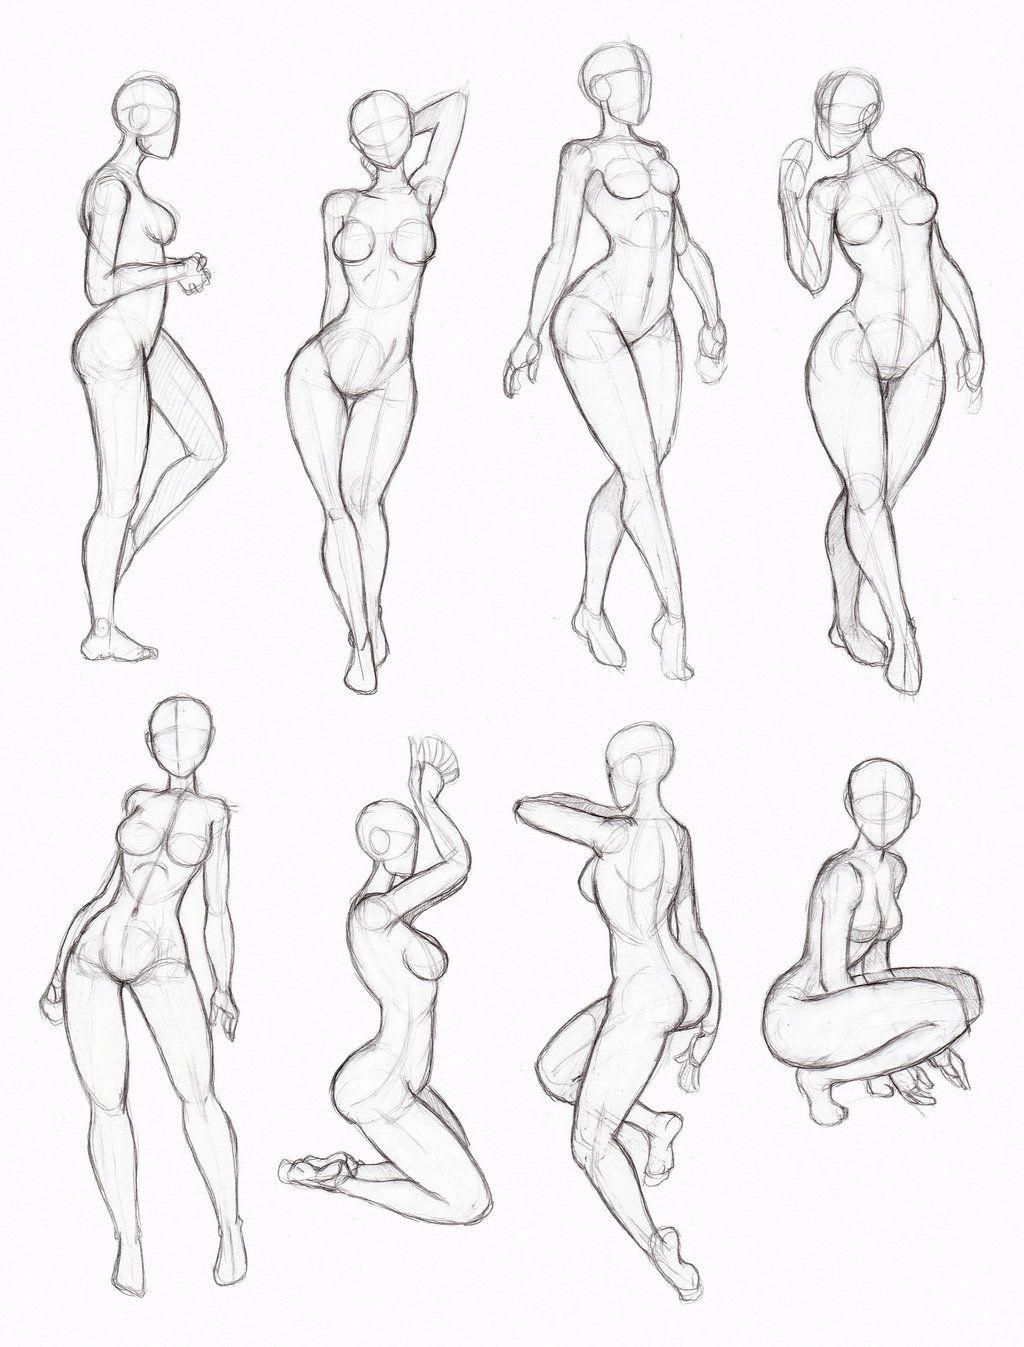 tipos de poses: mujer, manga | Anime | Pinterest | Tipos de poses ...